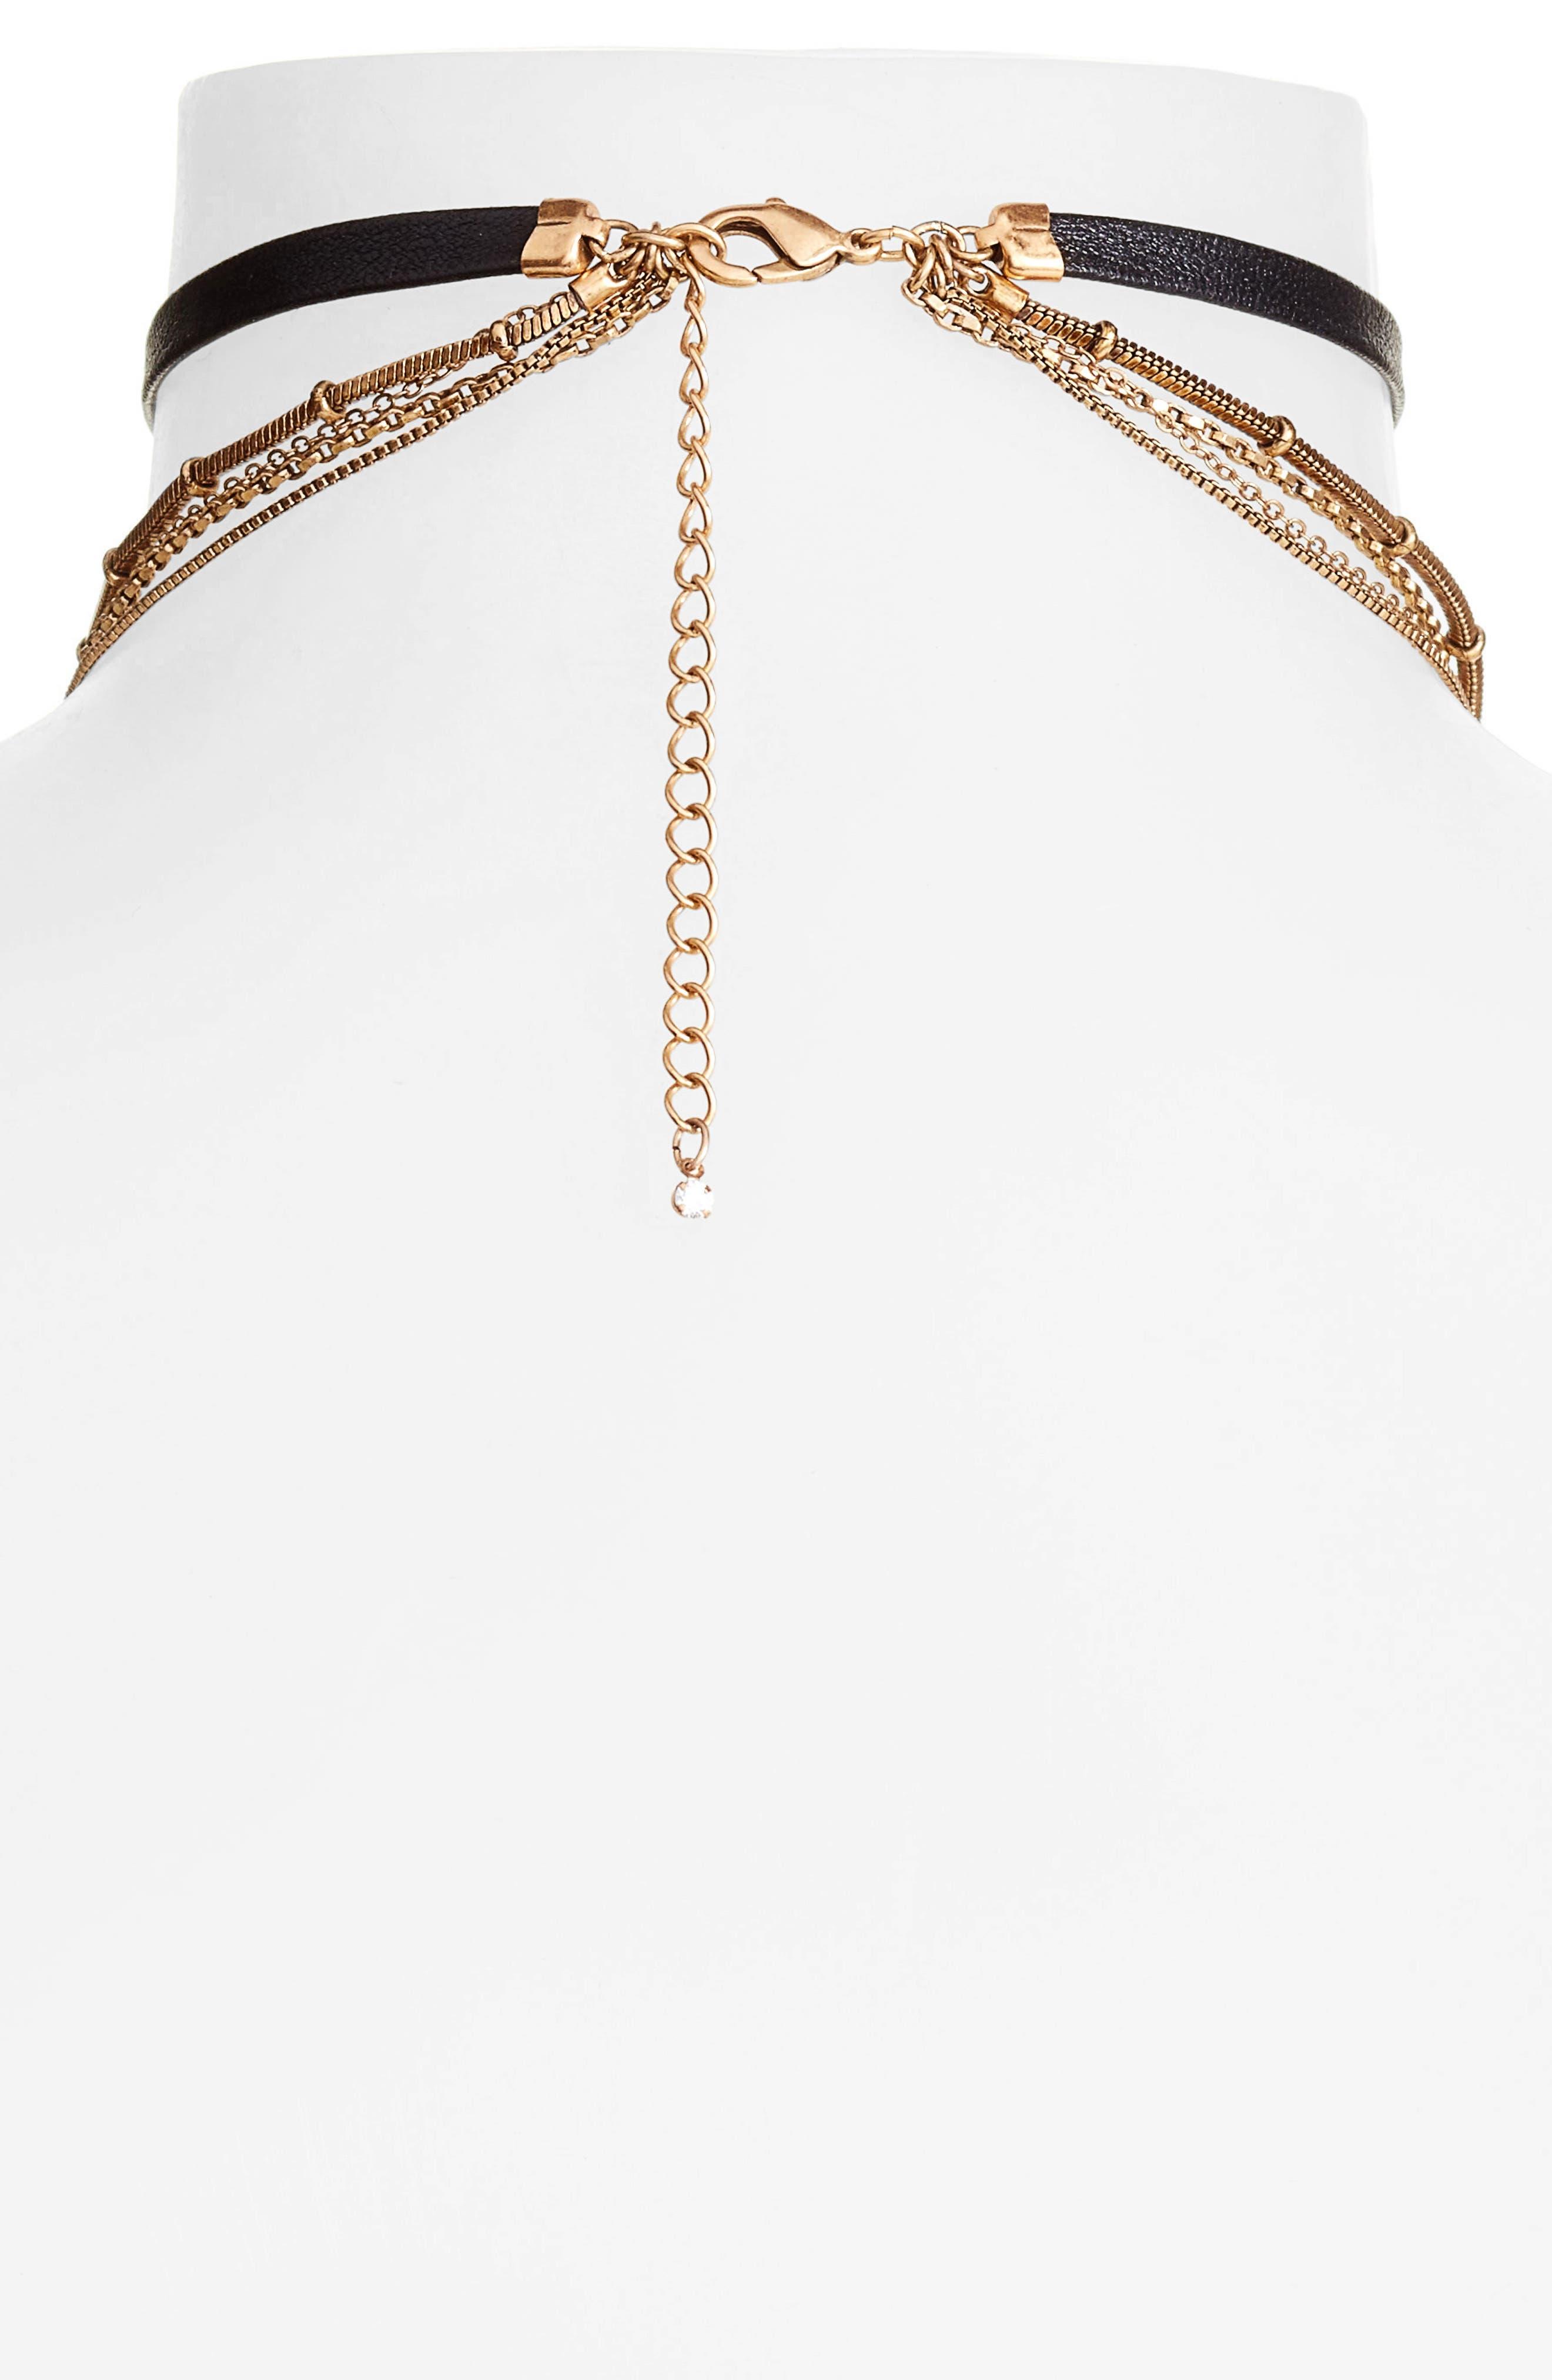 Multstrand Choker Necklace,                             Alternate thumbnail 2, color,                             Clear- Gold- Black